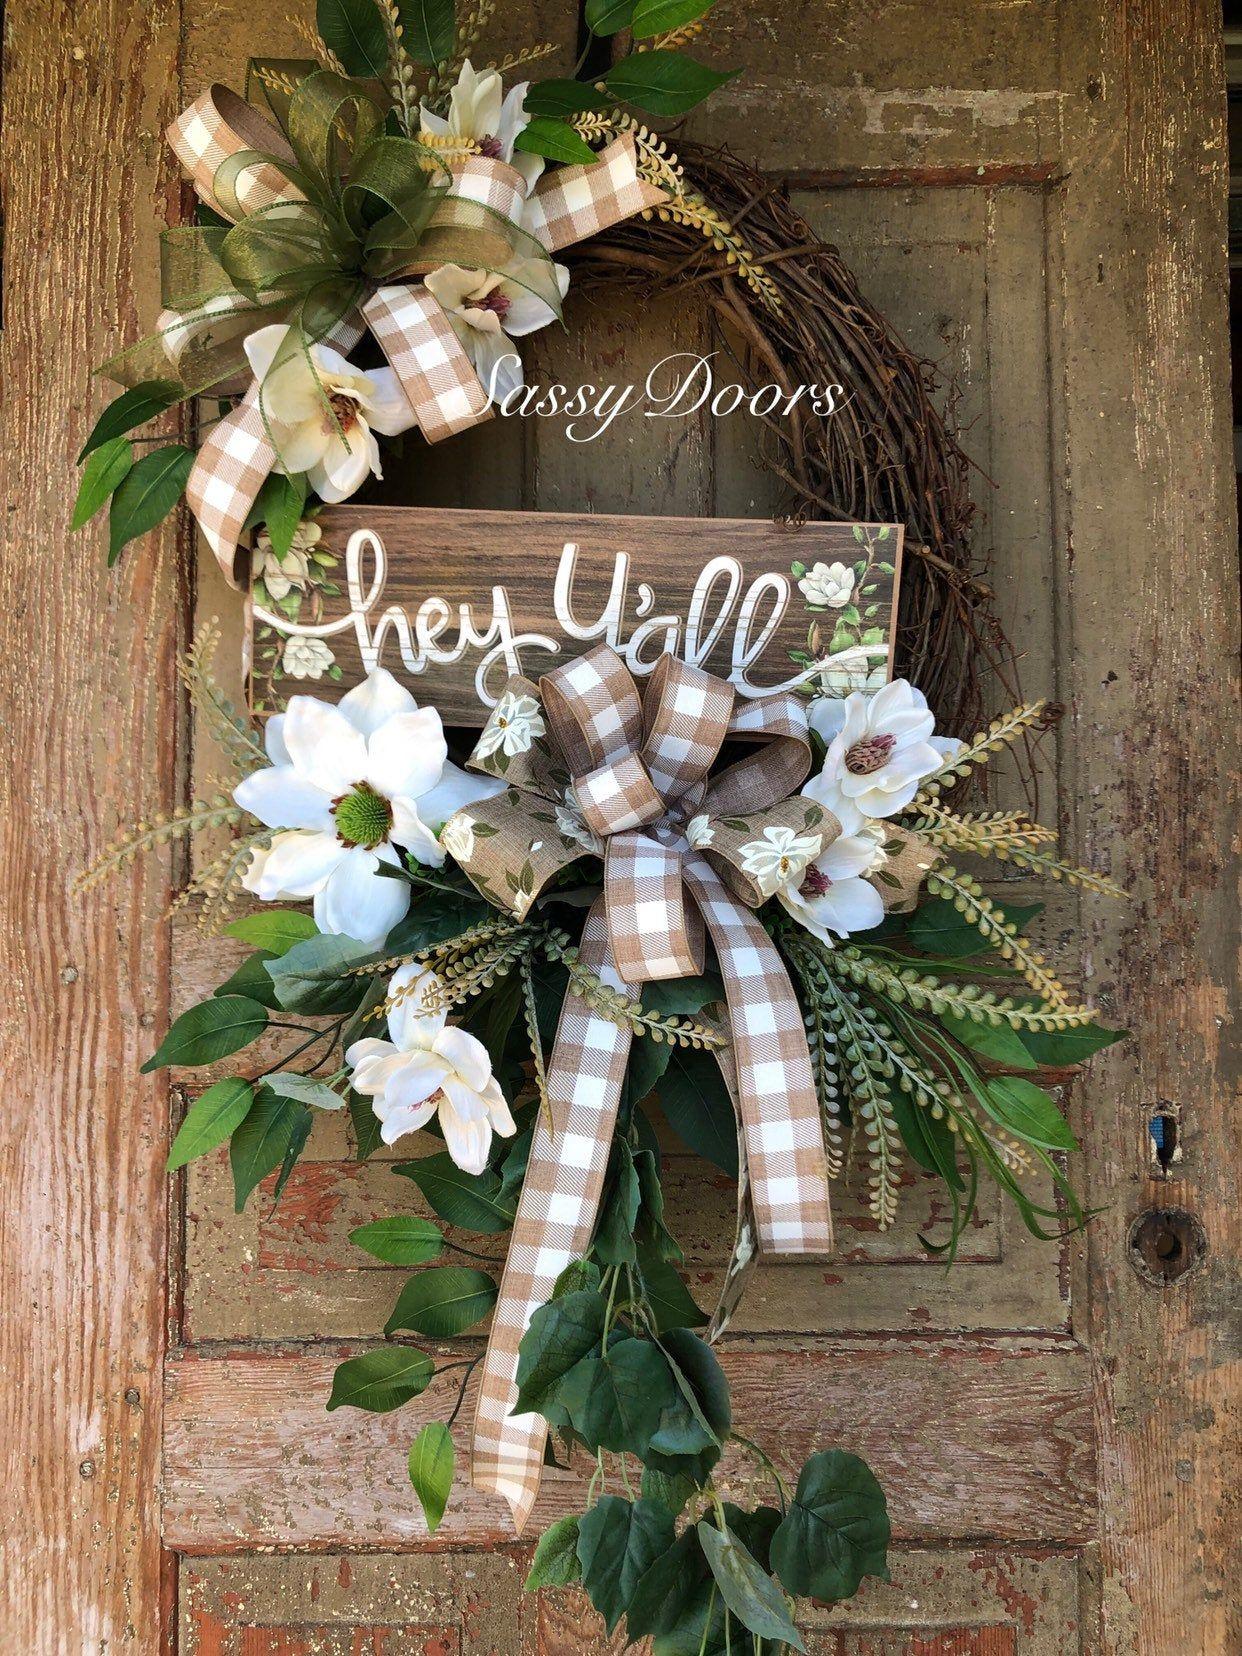 Photo of Everyday wreath-grapevine wreath-magnolia wreath for front door wreath with magnolias, wreath-cheeky door wreath,